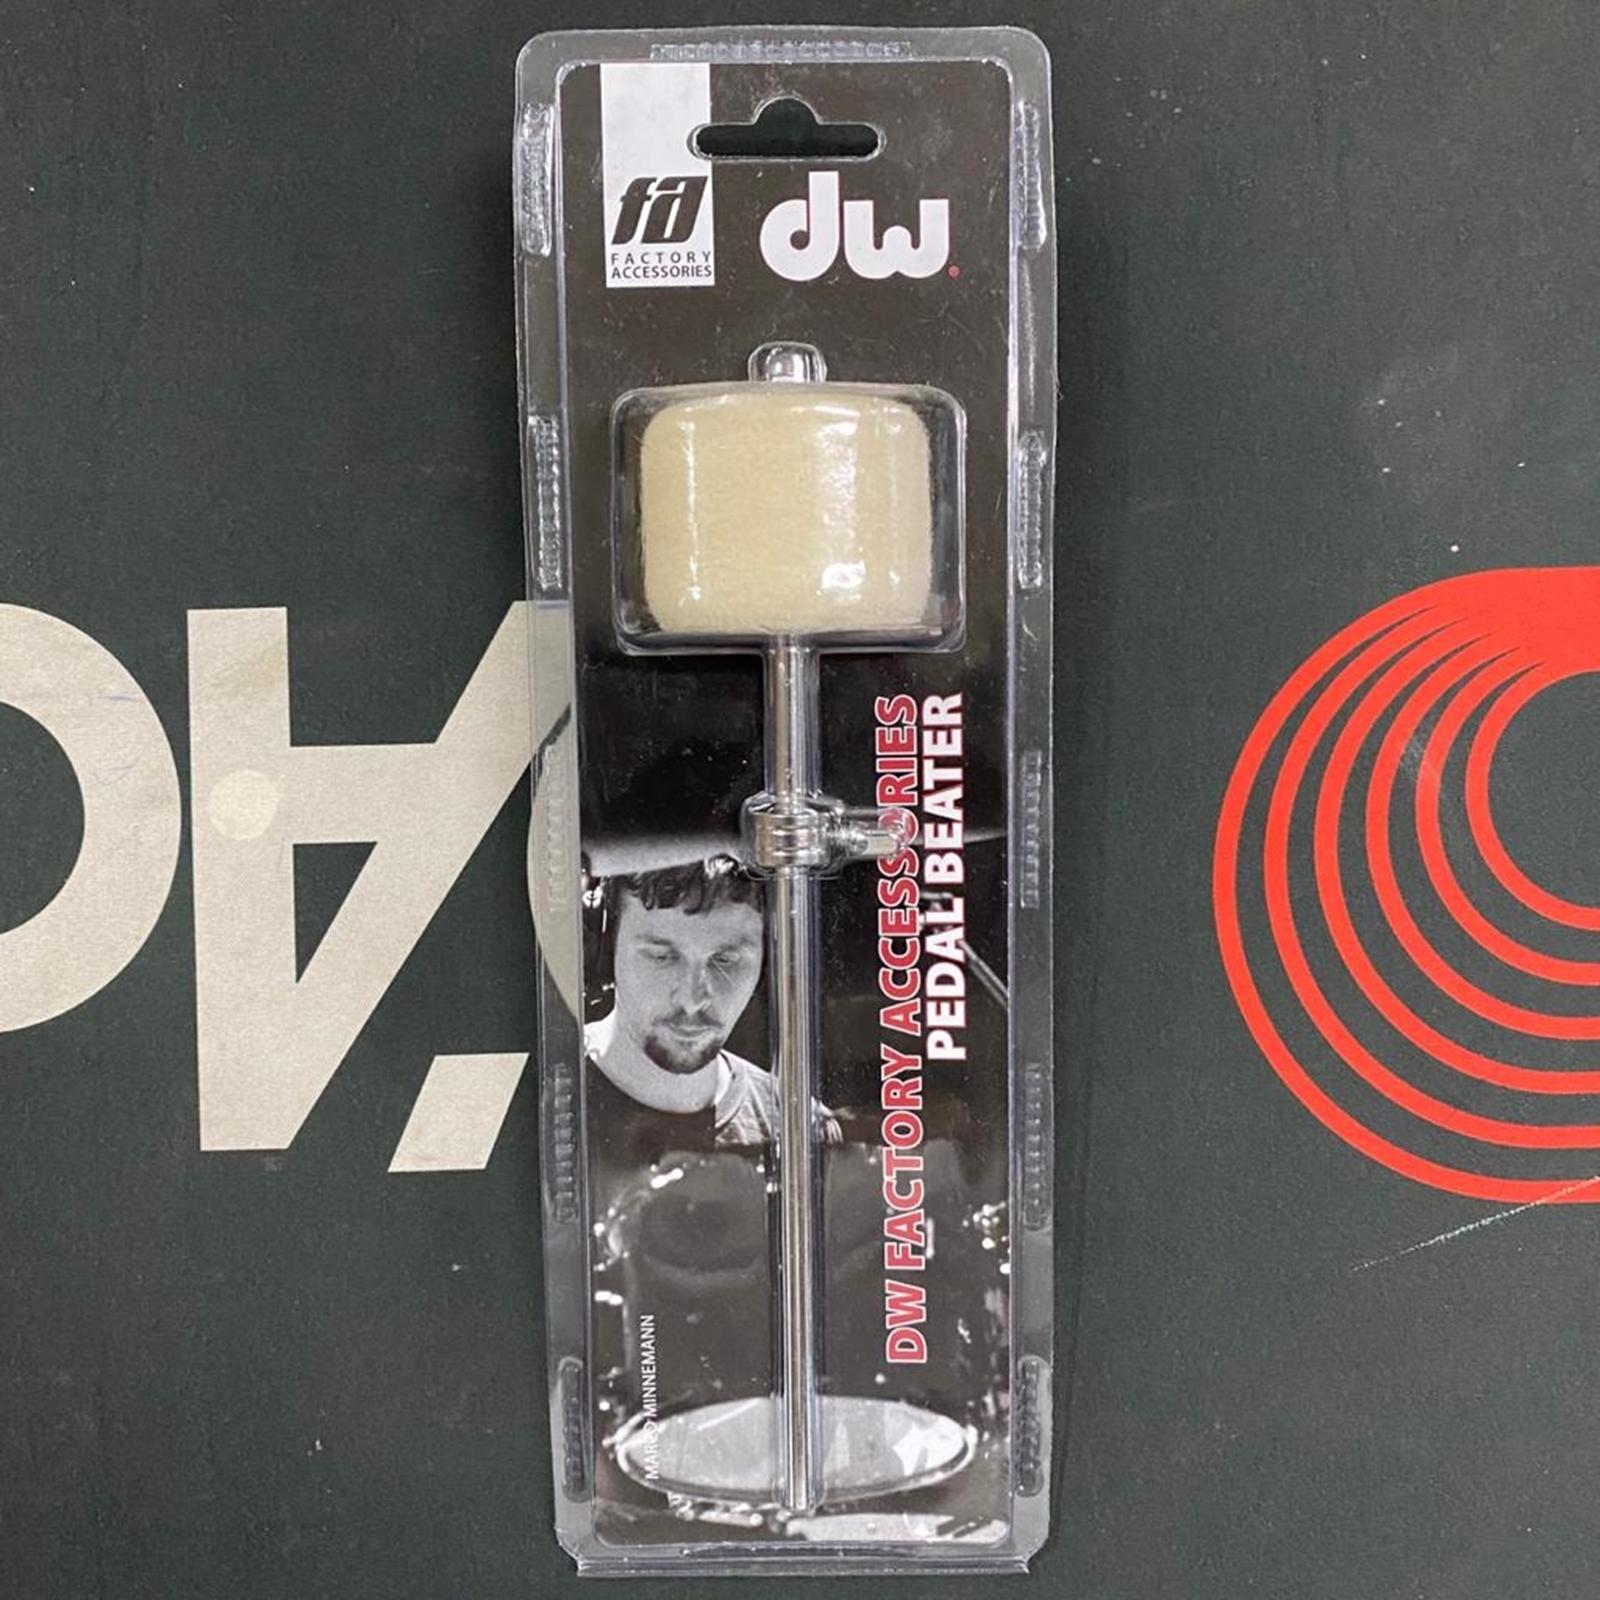 Batedor para pedal de bateria DW DWSM102 Large Felt